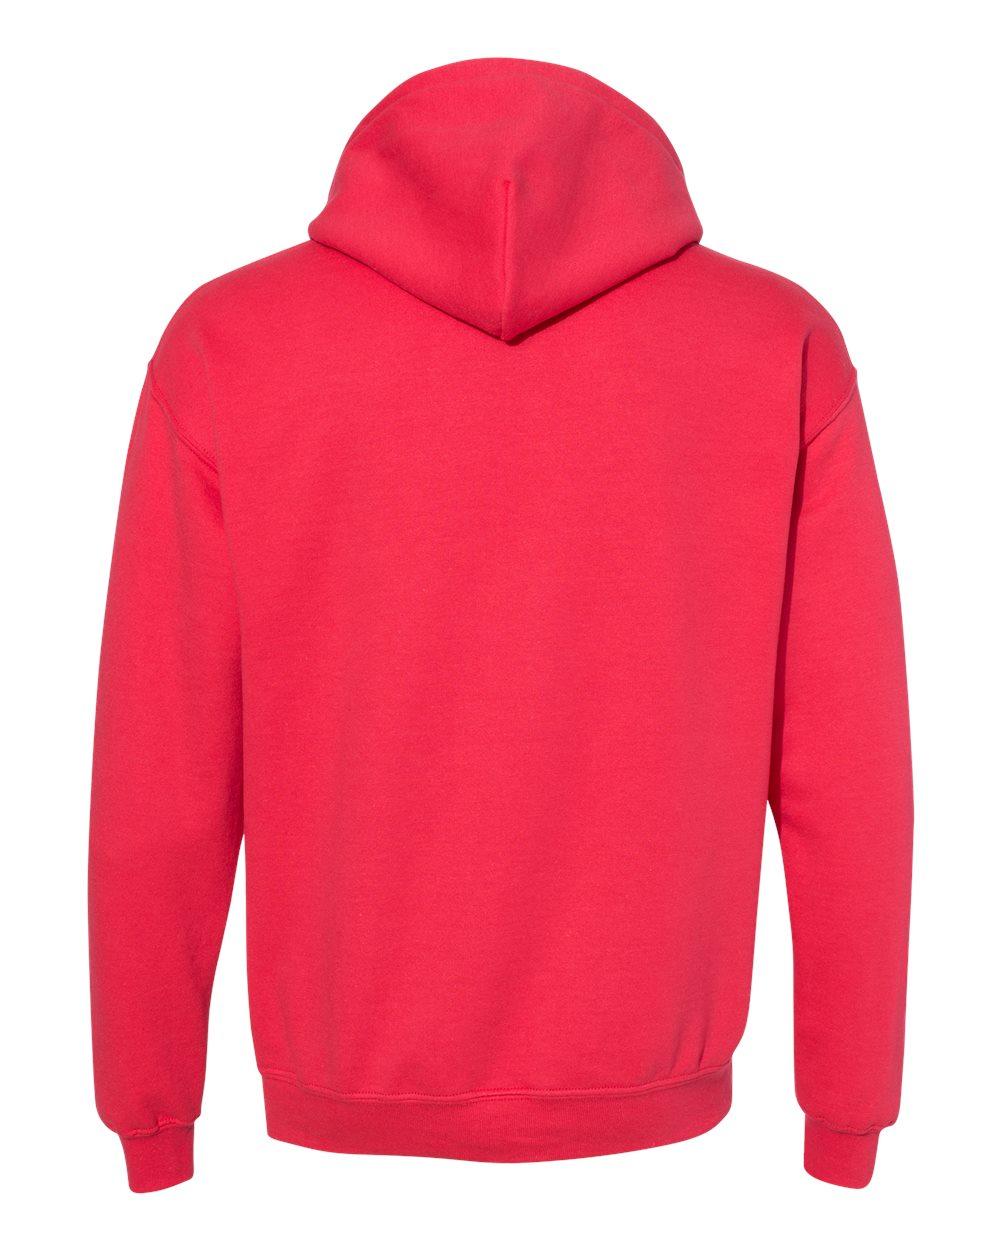 Gildan-Mens-Blank-Hoodie-Heavy-Blend-Hooded-Sweatshirt-18500-up-to-5XL thumbnail 43